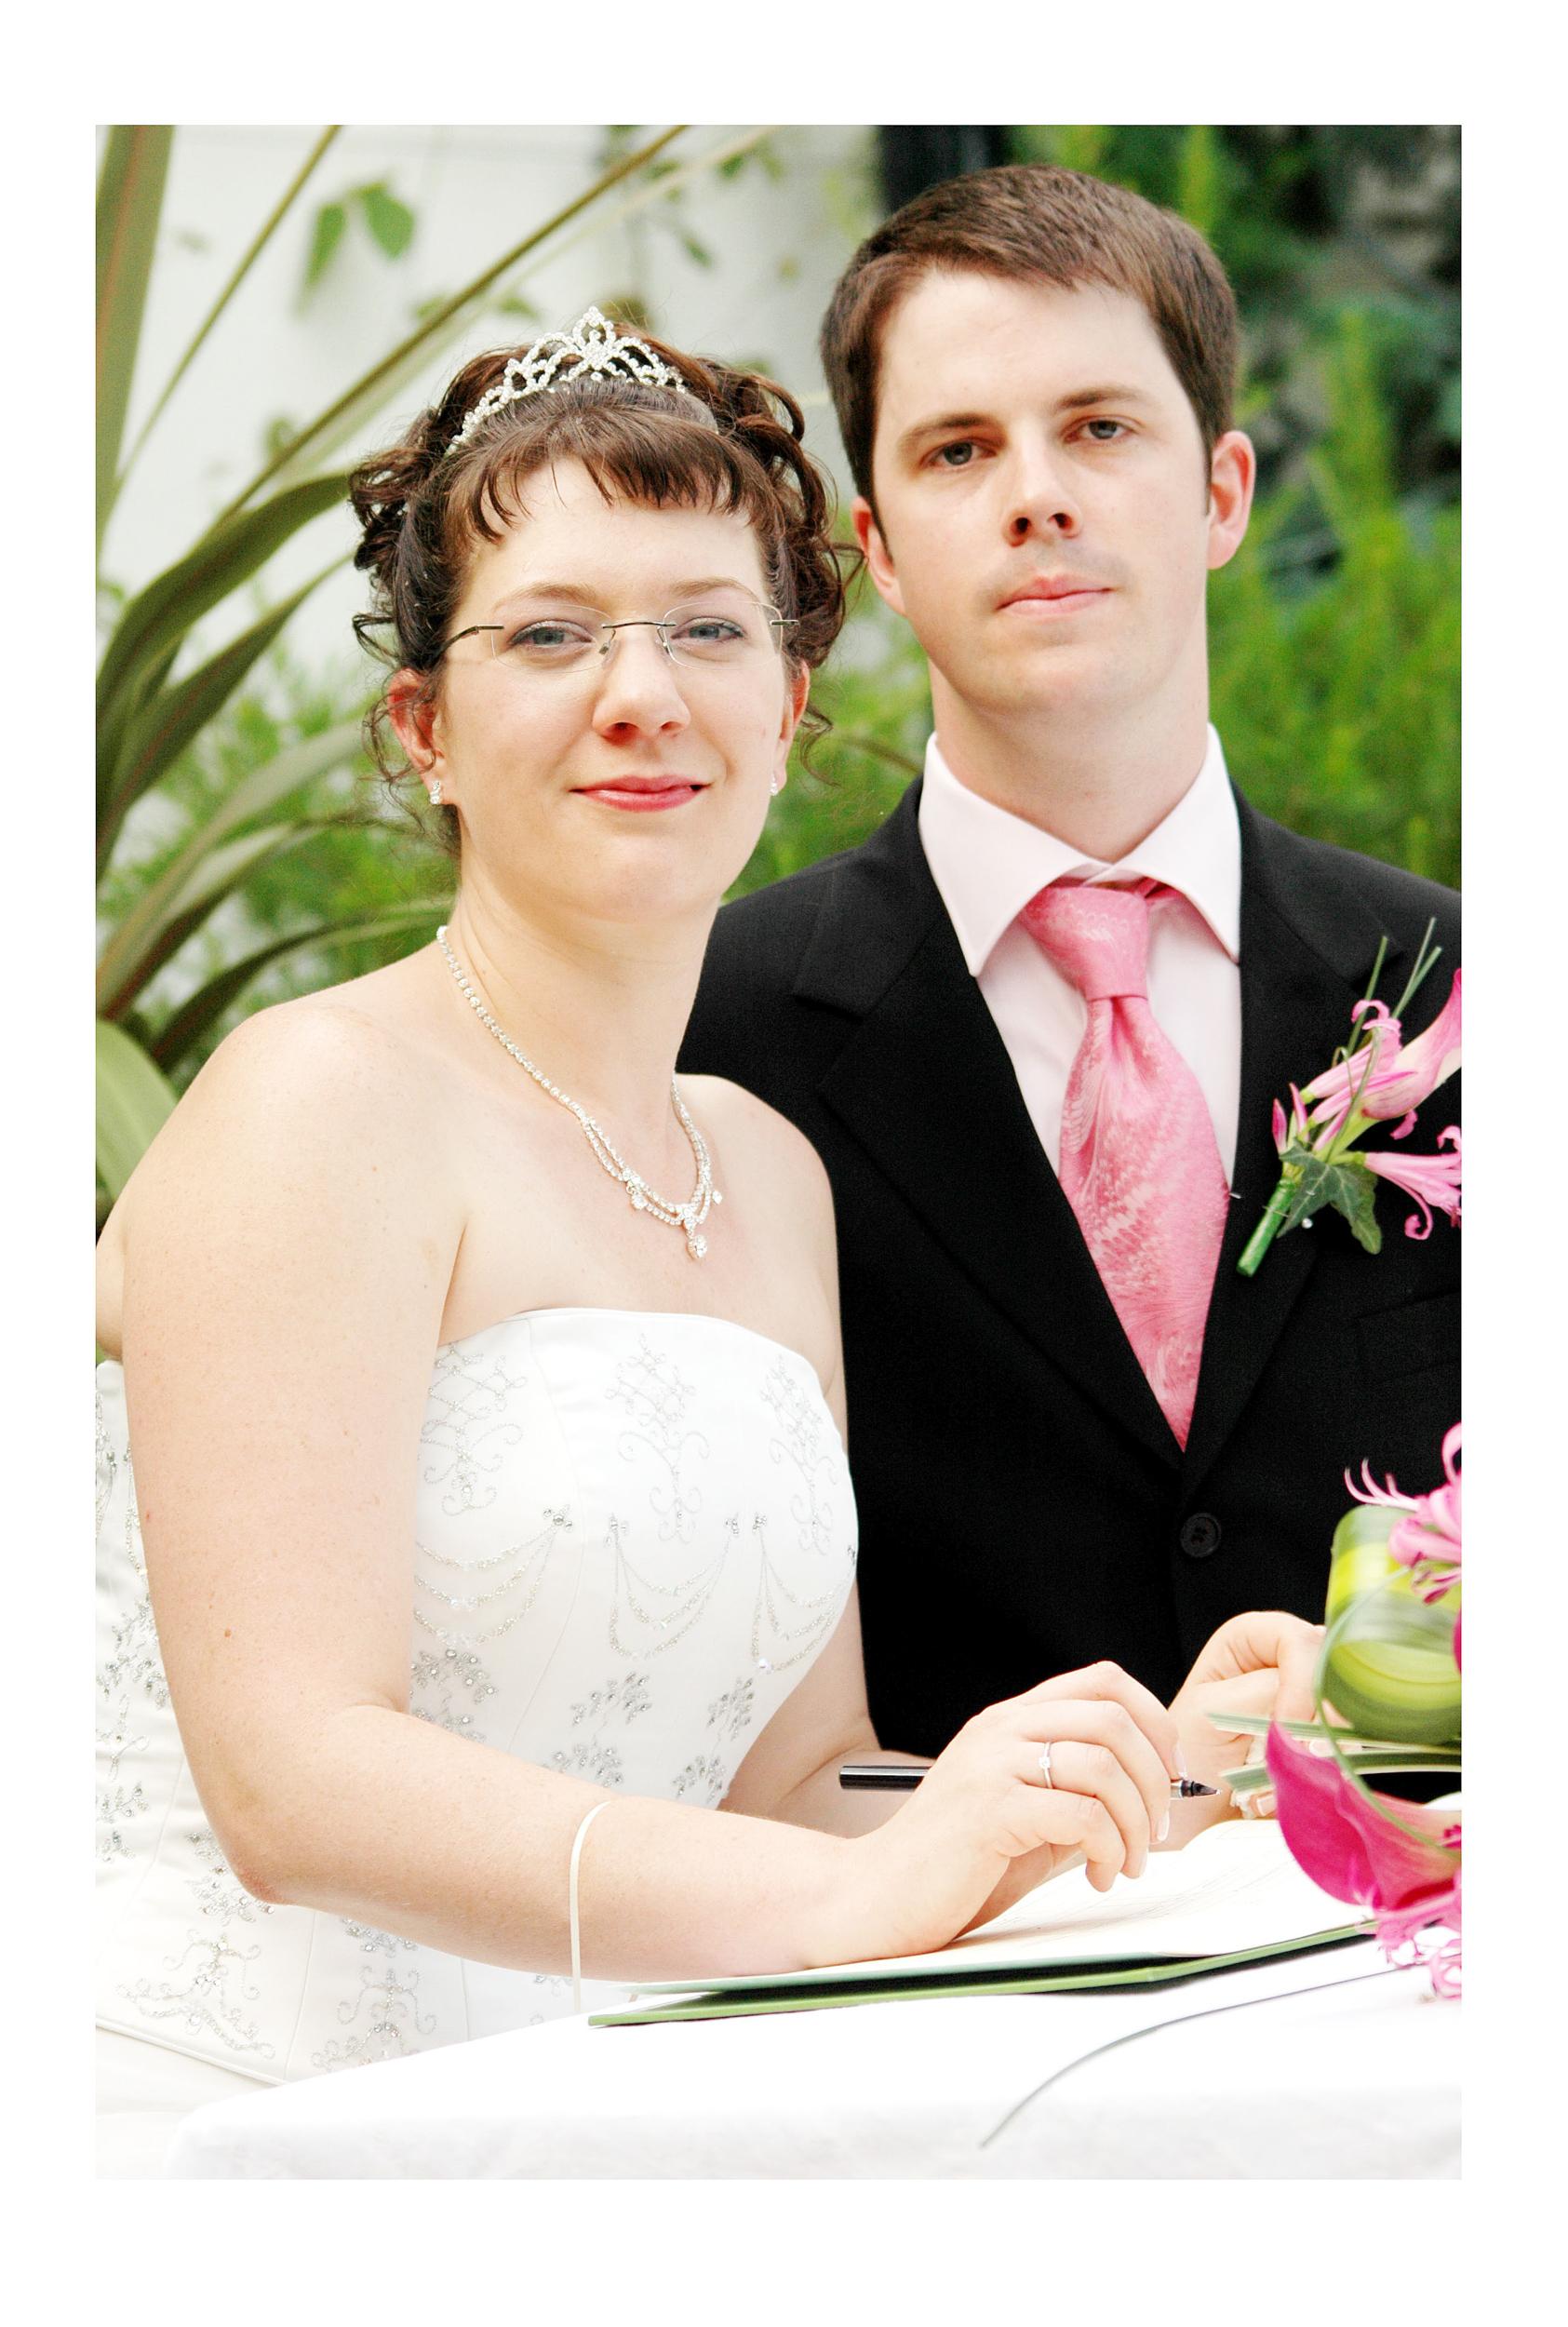 REPORTAGE-WEDDING-PHOTOGRAPHY-SET-UK-21.jpg